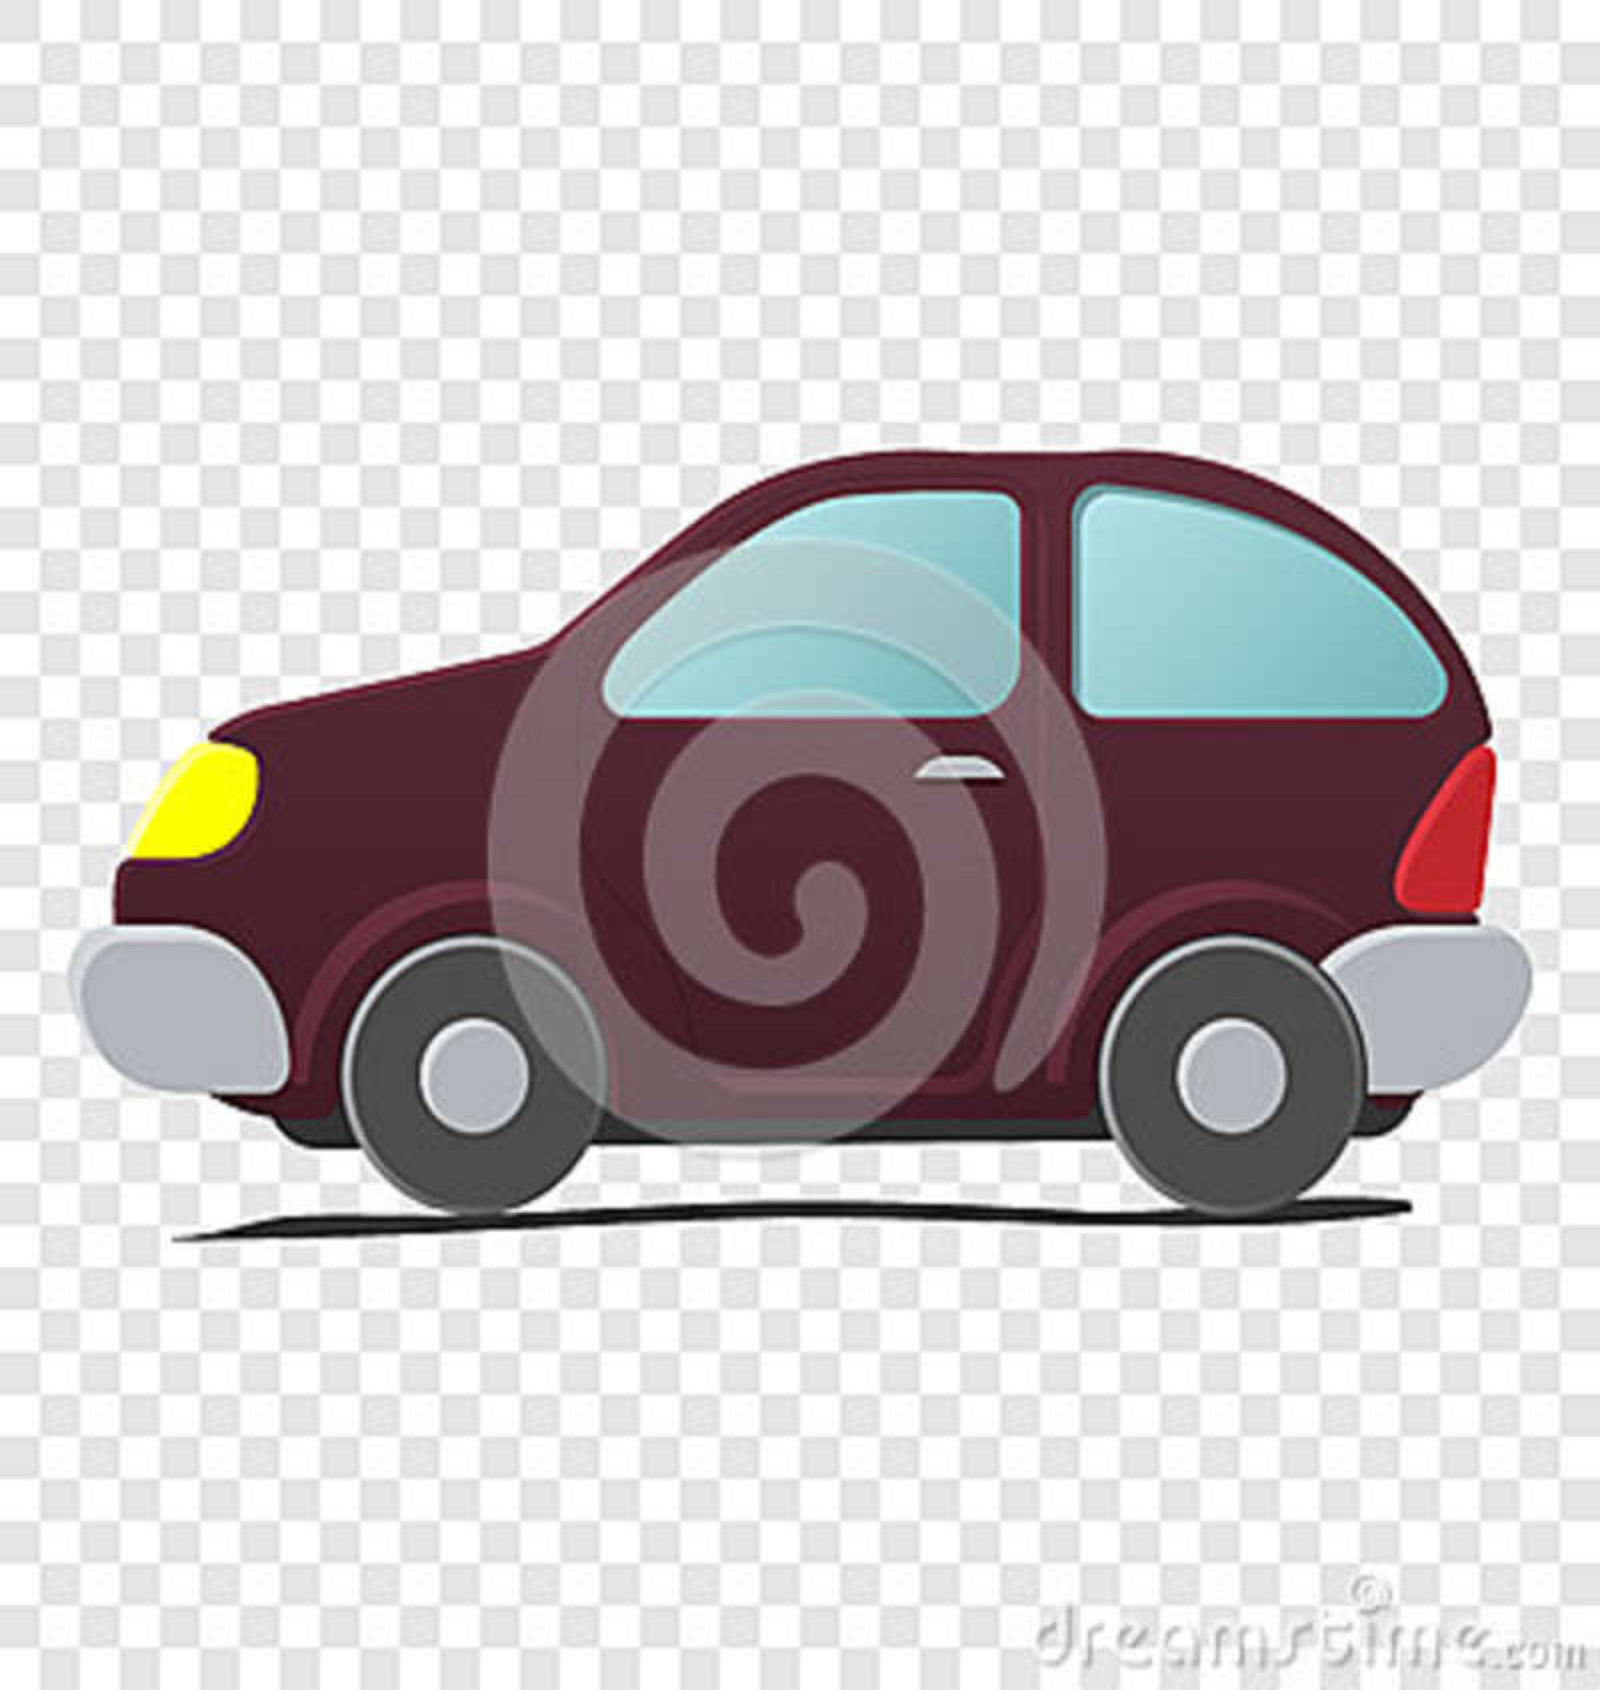 Cartoon Little Car Stock Vector Illustration Of Couper 79721928